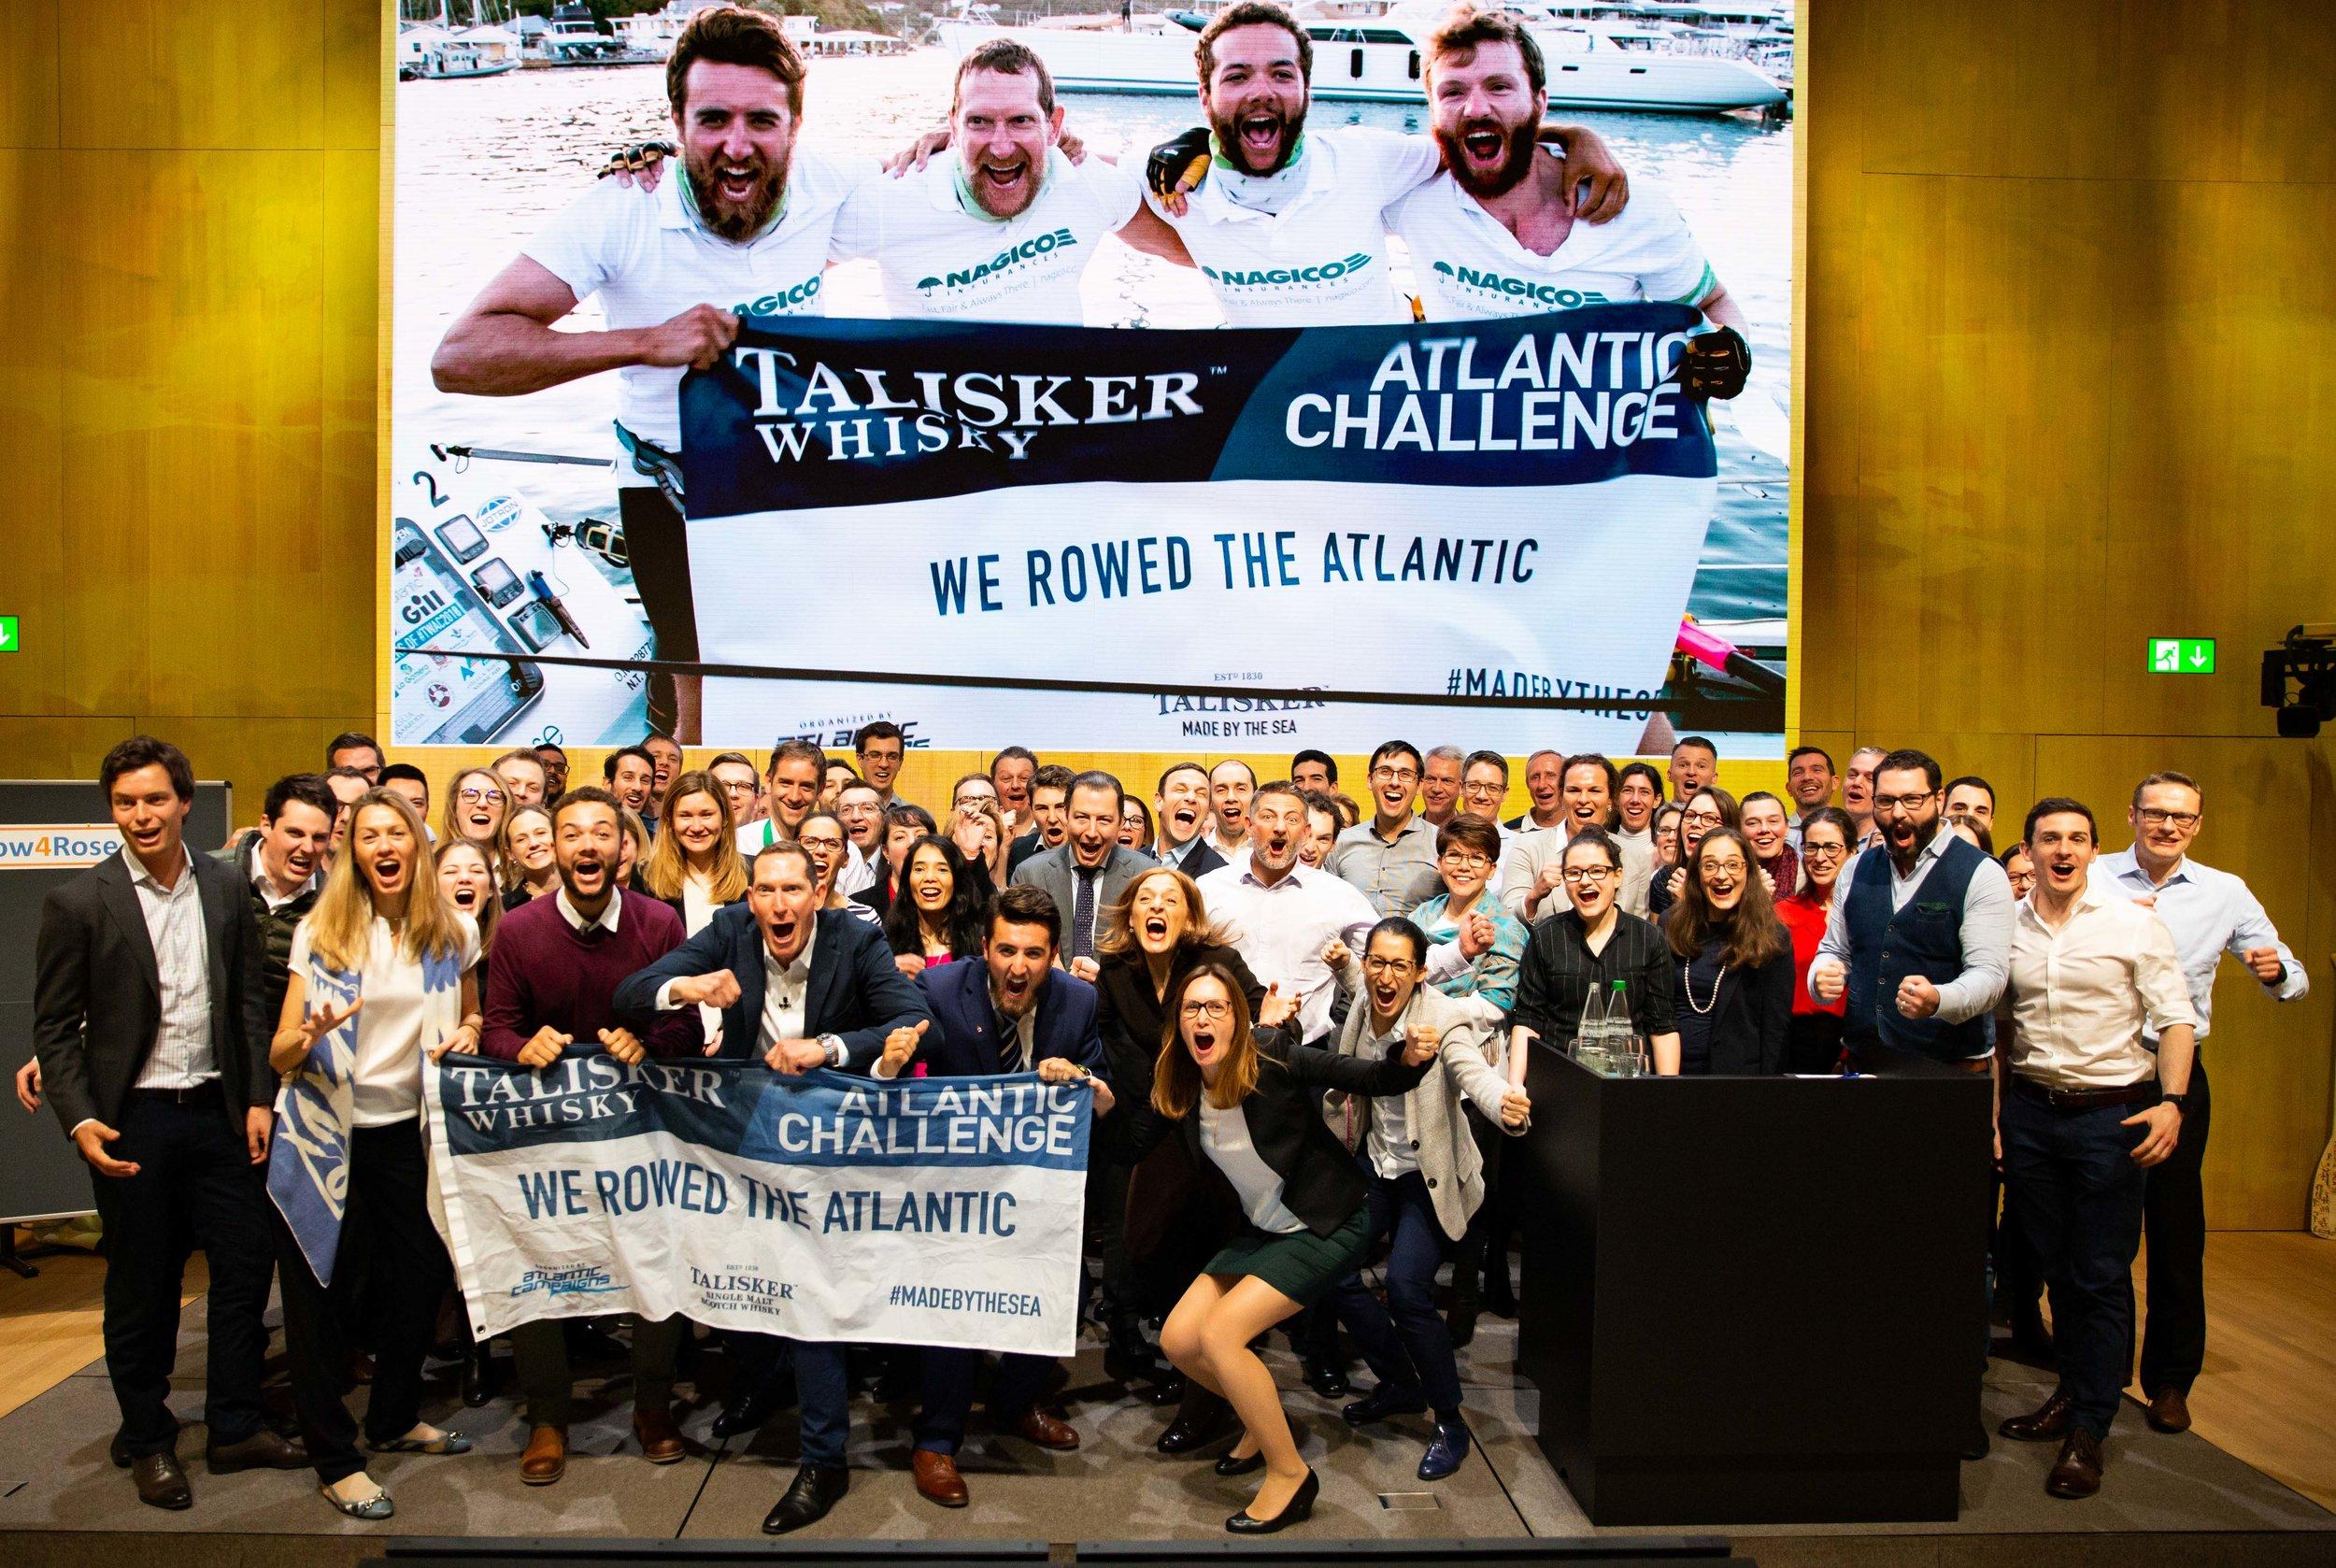 twac2018 #atlanticcampaigns #madebythesea #talisker #atlantic